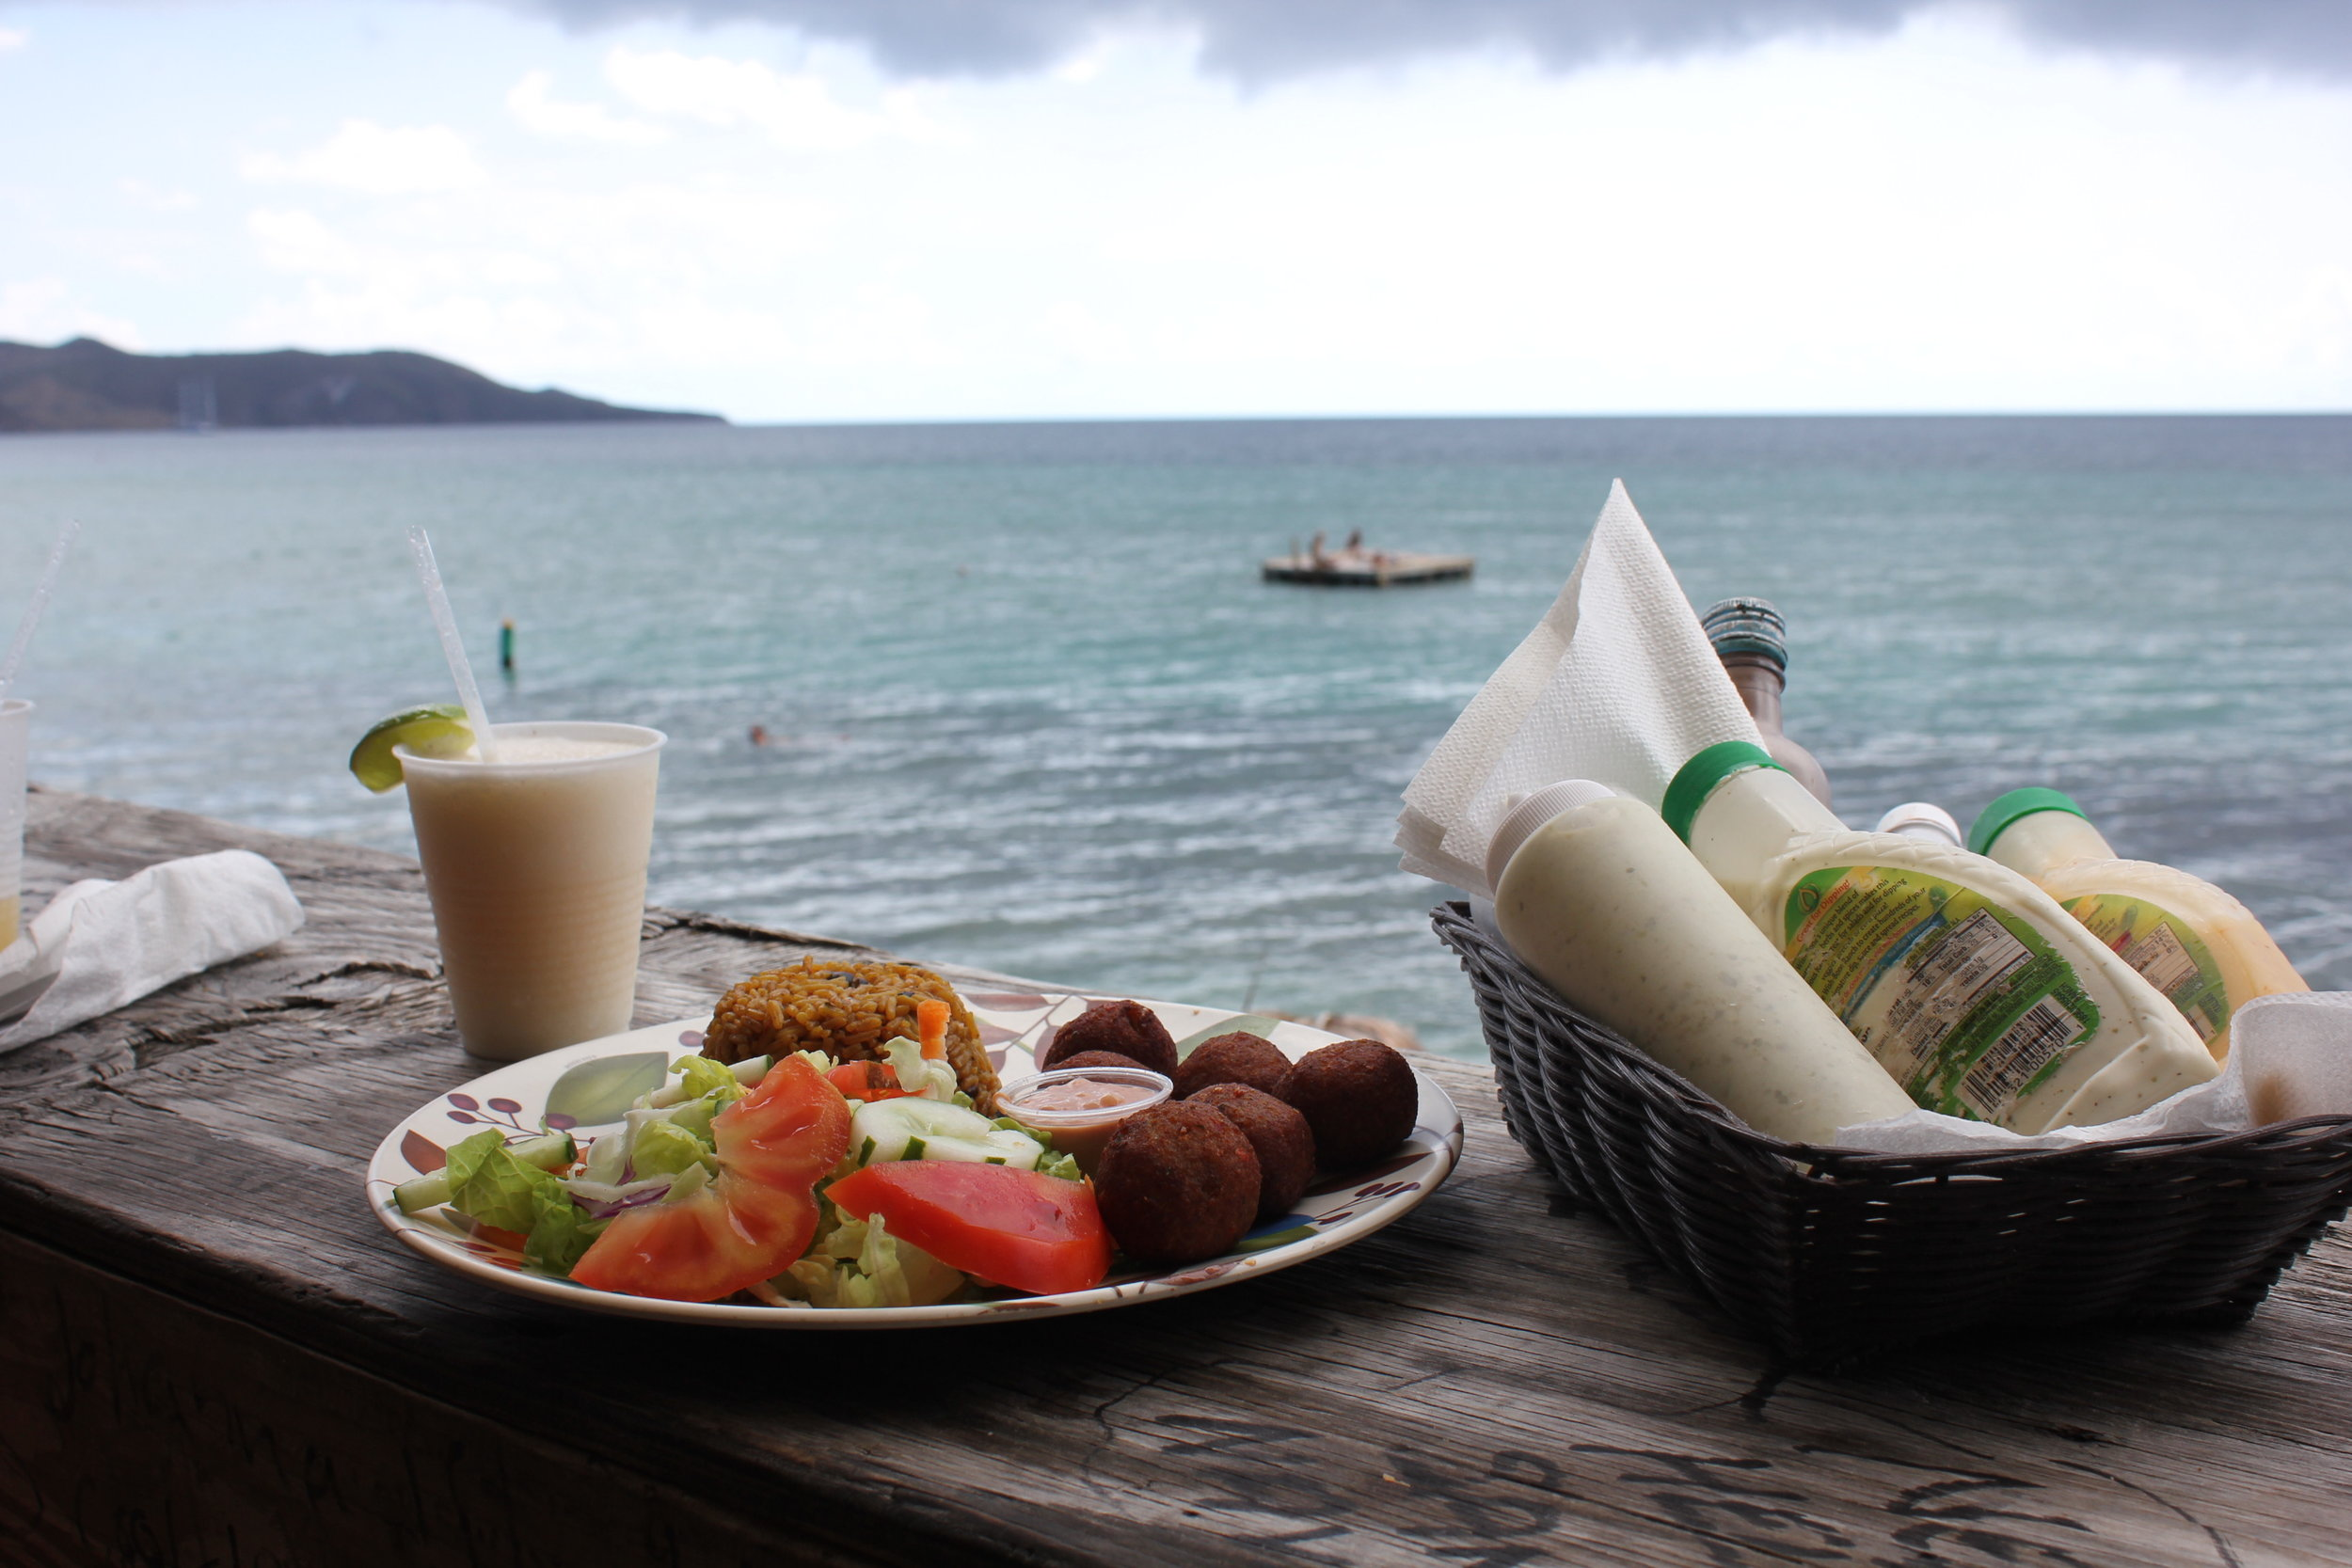 South Friar's Bay – Lunch at Shipwreck Beach Bar